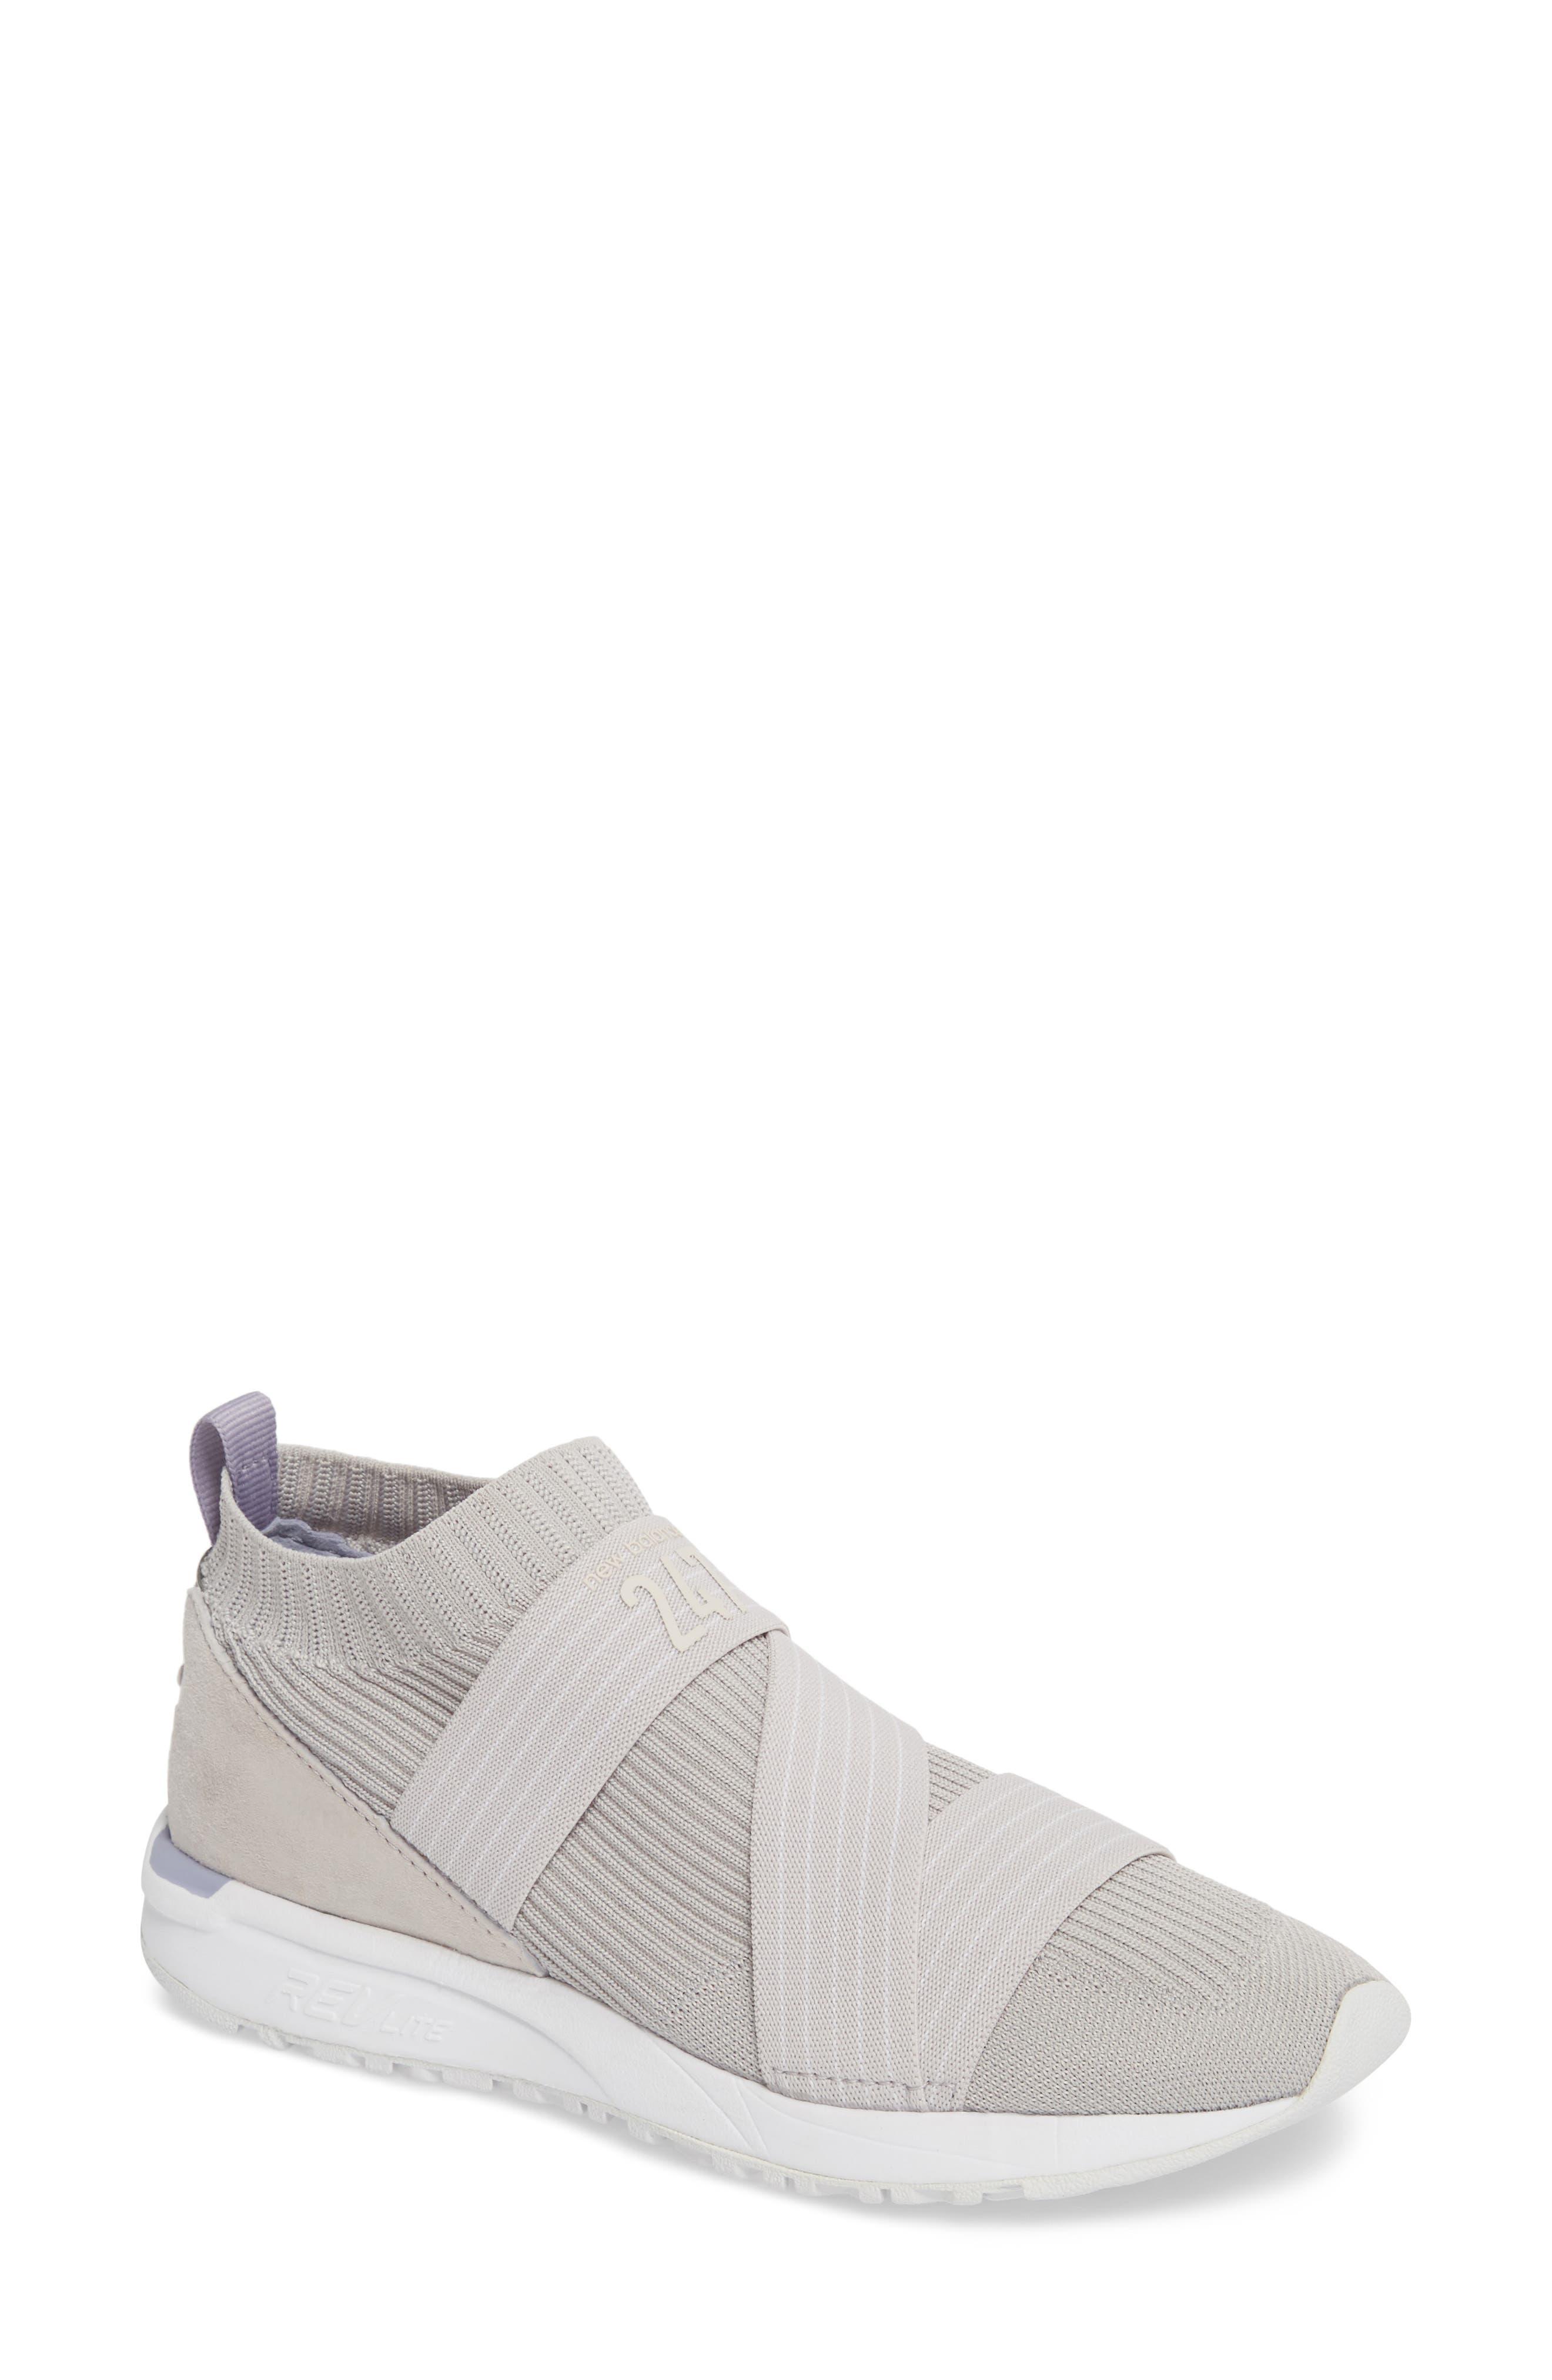 247 Knit Sneaker,                             Main thumbnail 1, color,